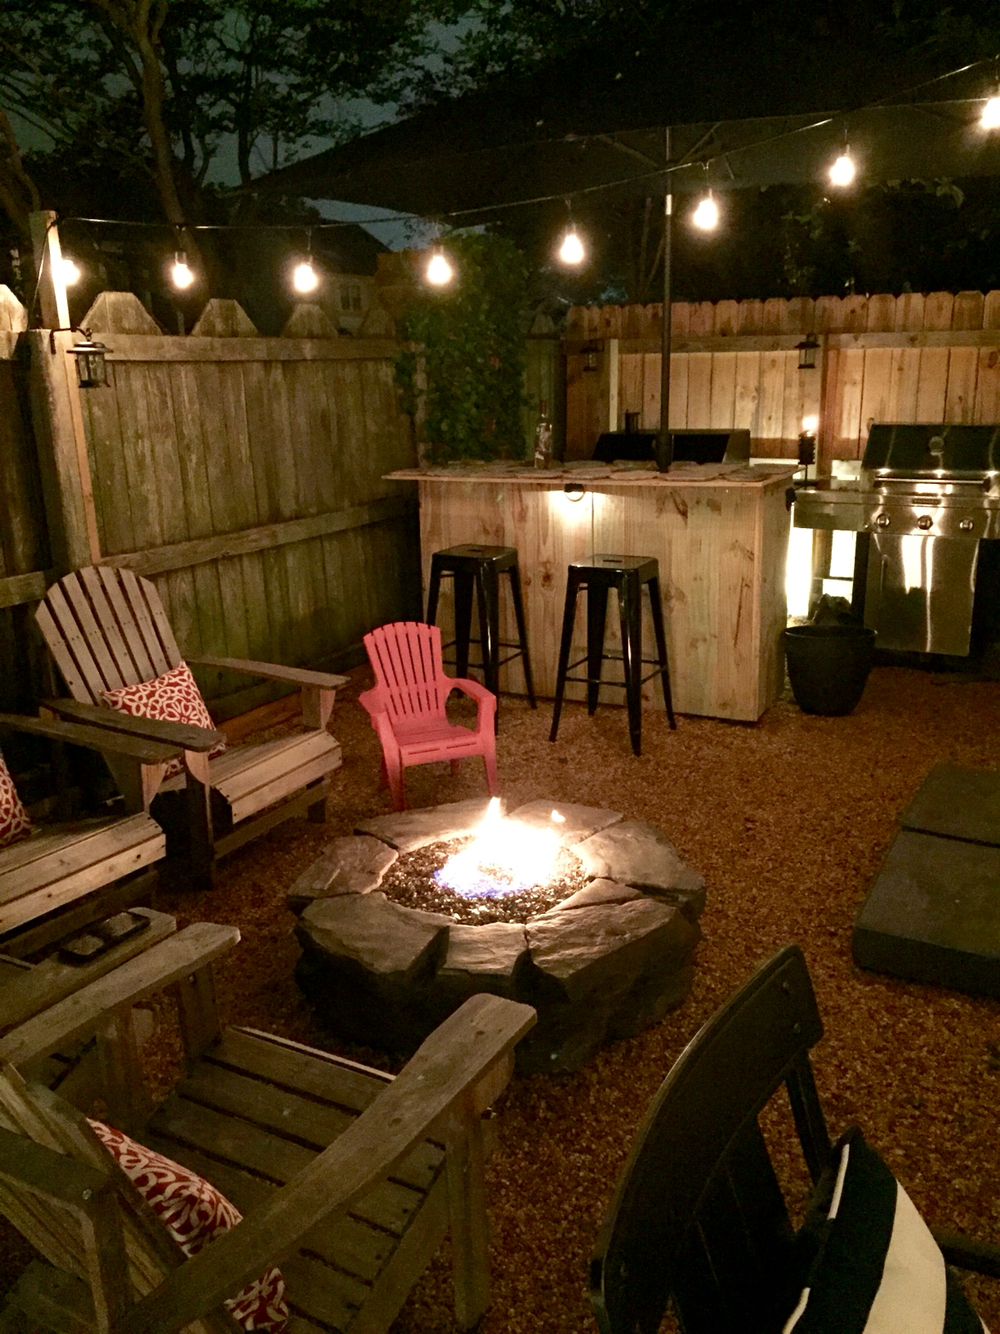 18 Fire Pit Ideas For Your Backyard - Best of DIY Ideas on Diy Back Patio Ideas id=86692